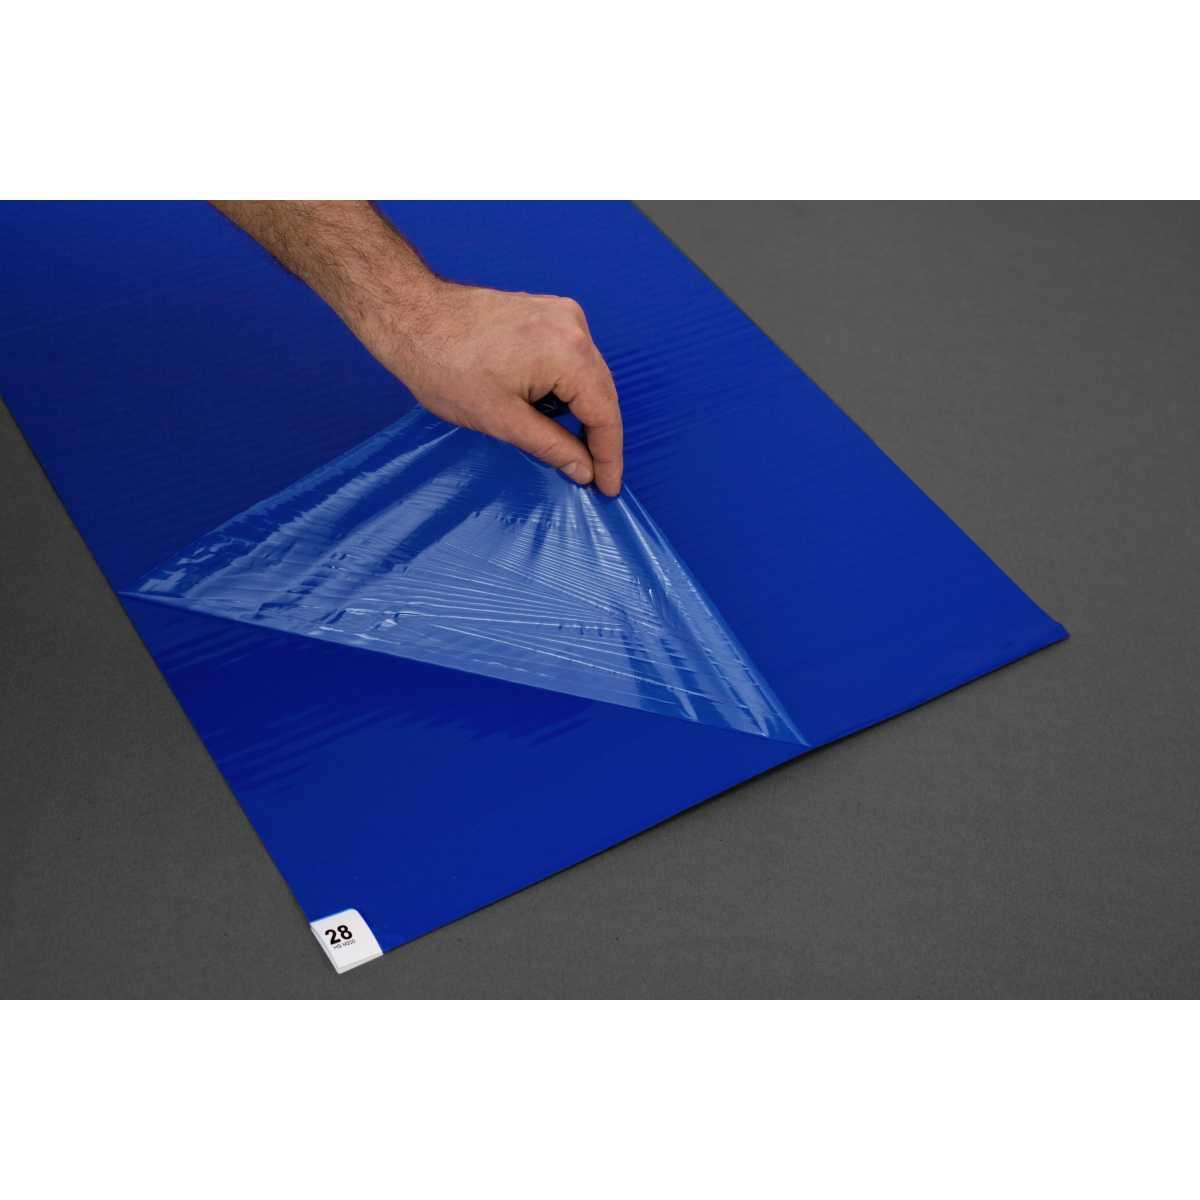 Carpet decontamination bactericidal 90 x 60 cm Mat of 30 sheets for 30 days